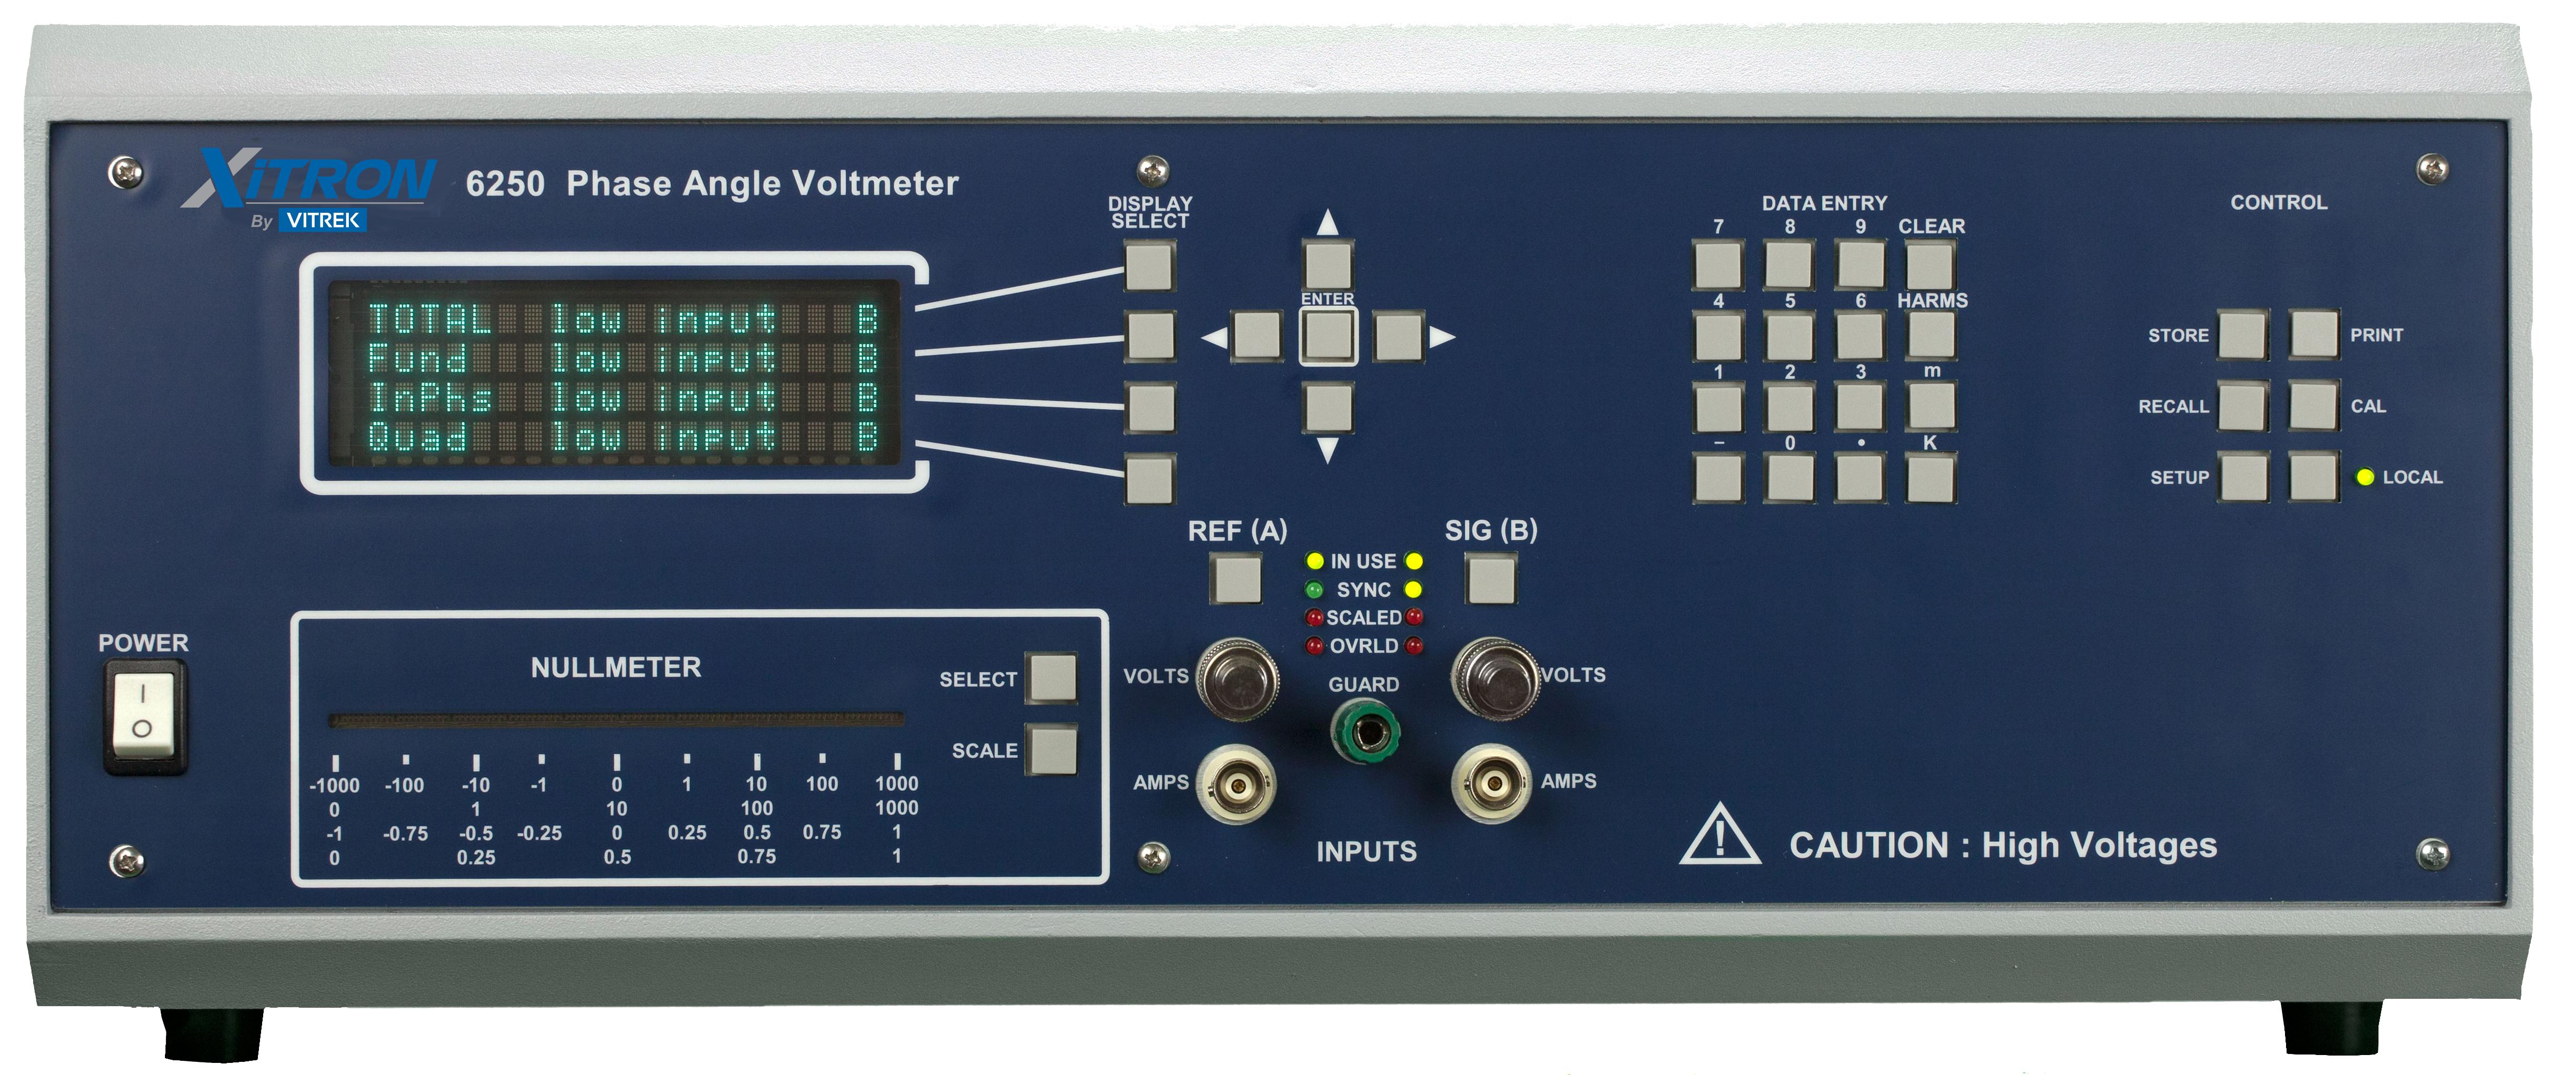 Xitron 6250 phase angle voltmeter